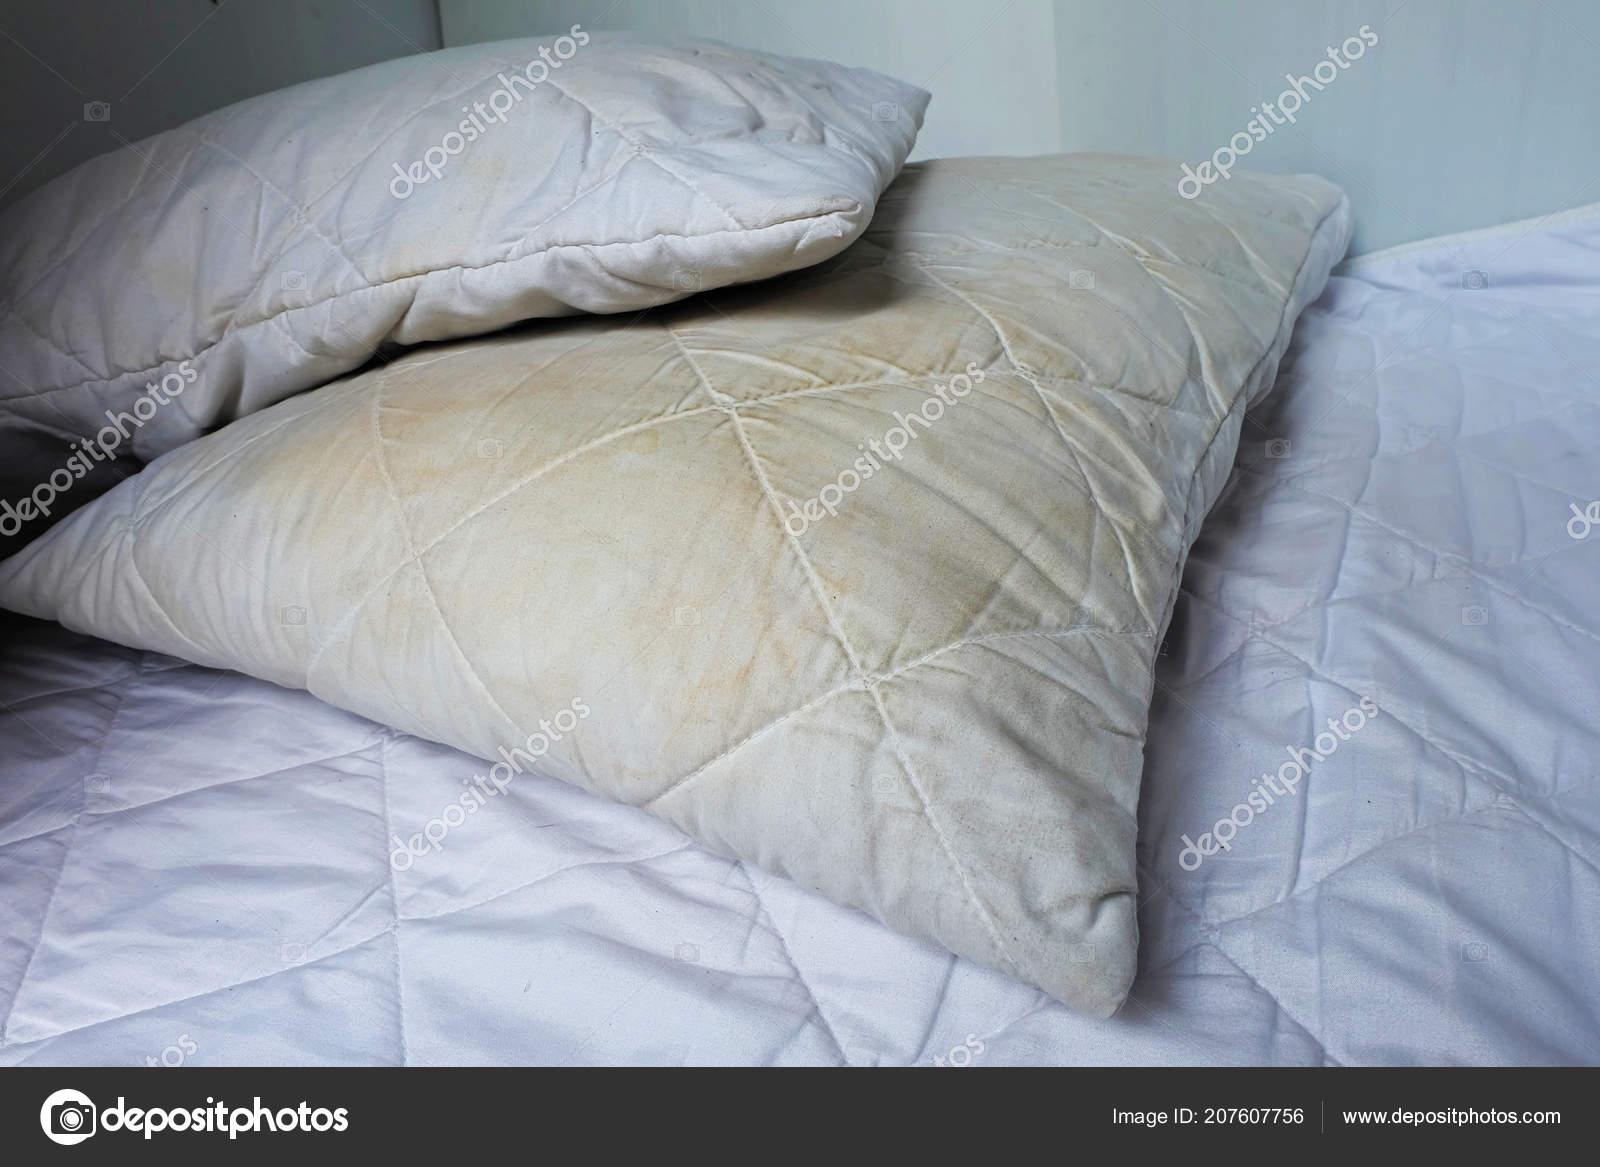 Dirty Pillow White Bed Stokovoe Foto C Damrong8899 207607756